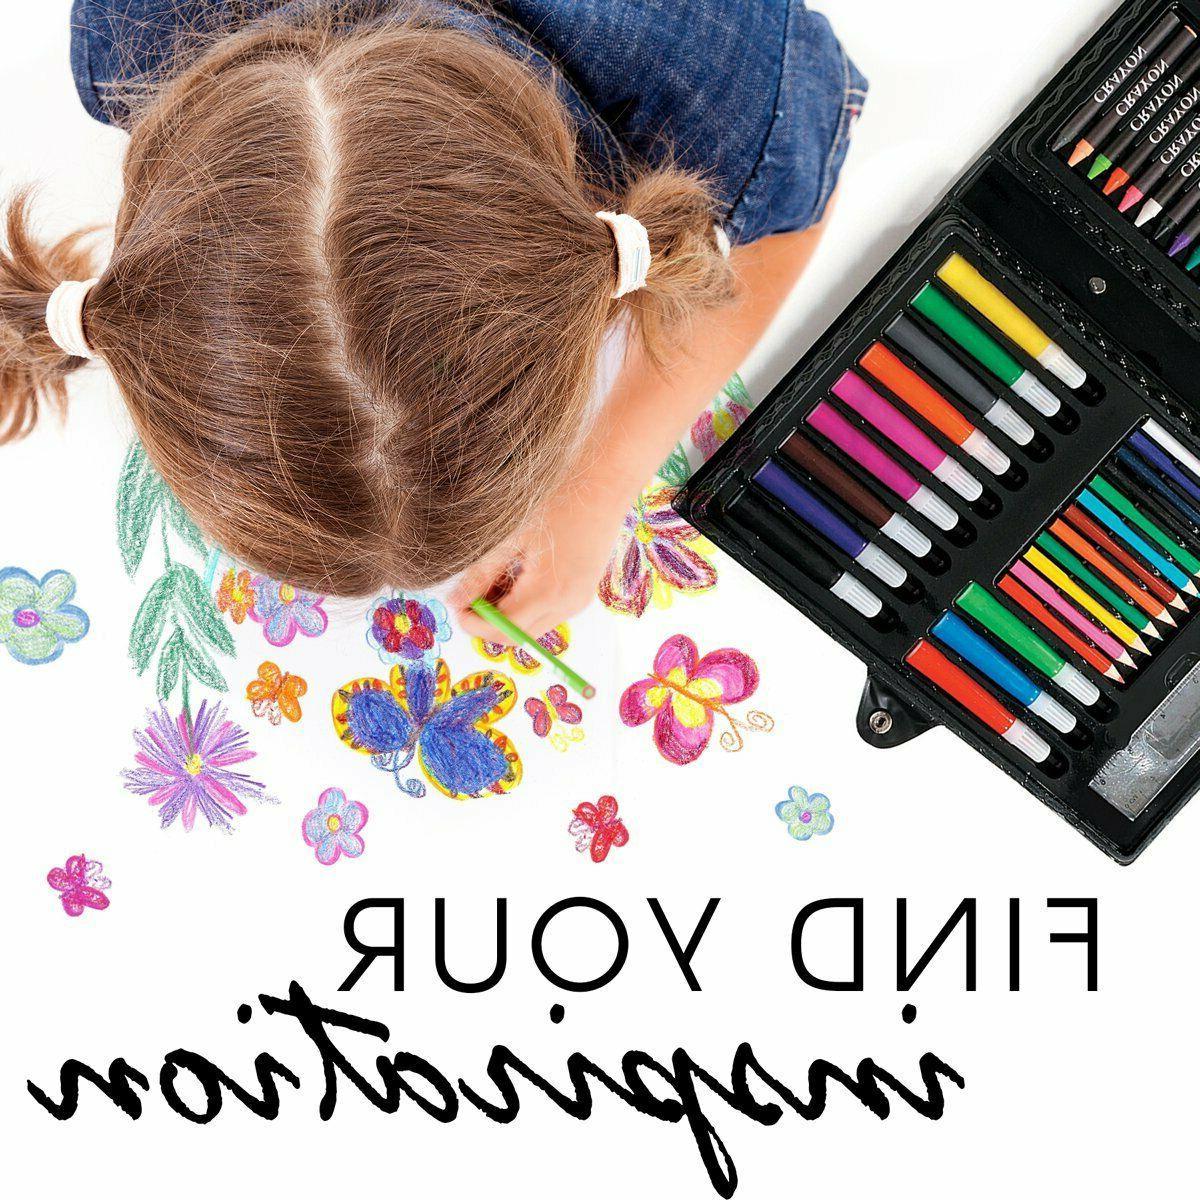 Art Kit Kids Teens Adults Supplies Drawing Painting Set